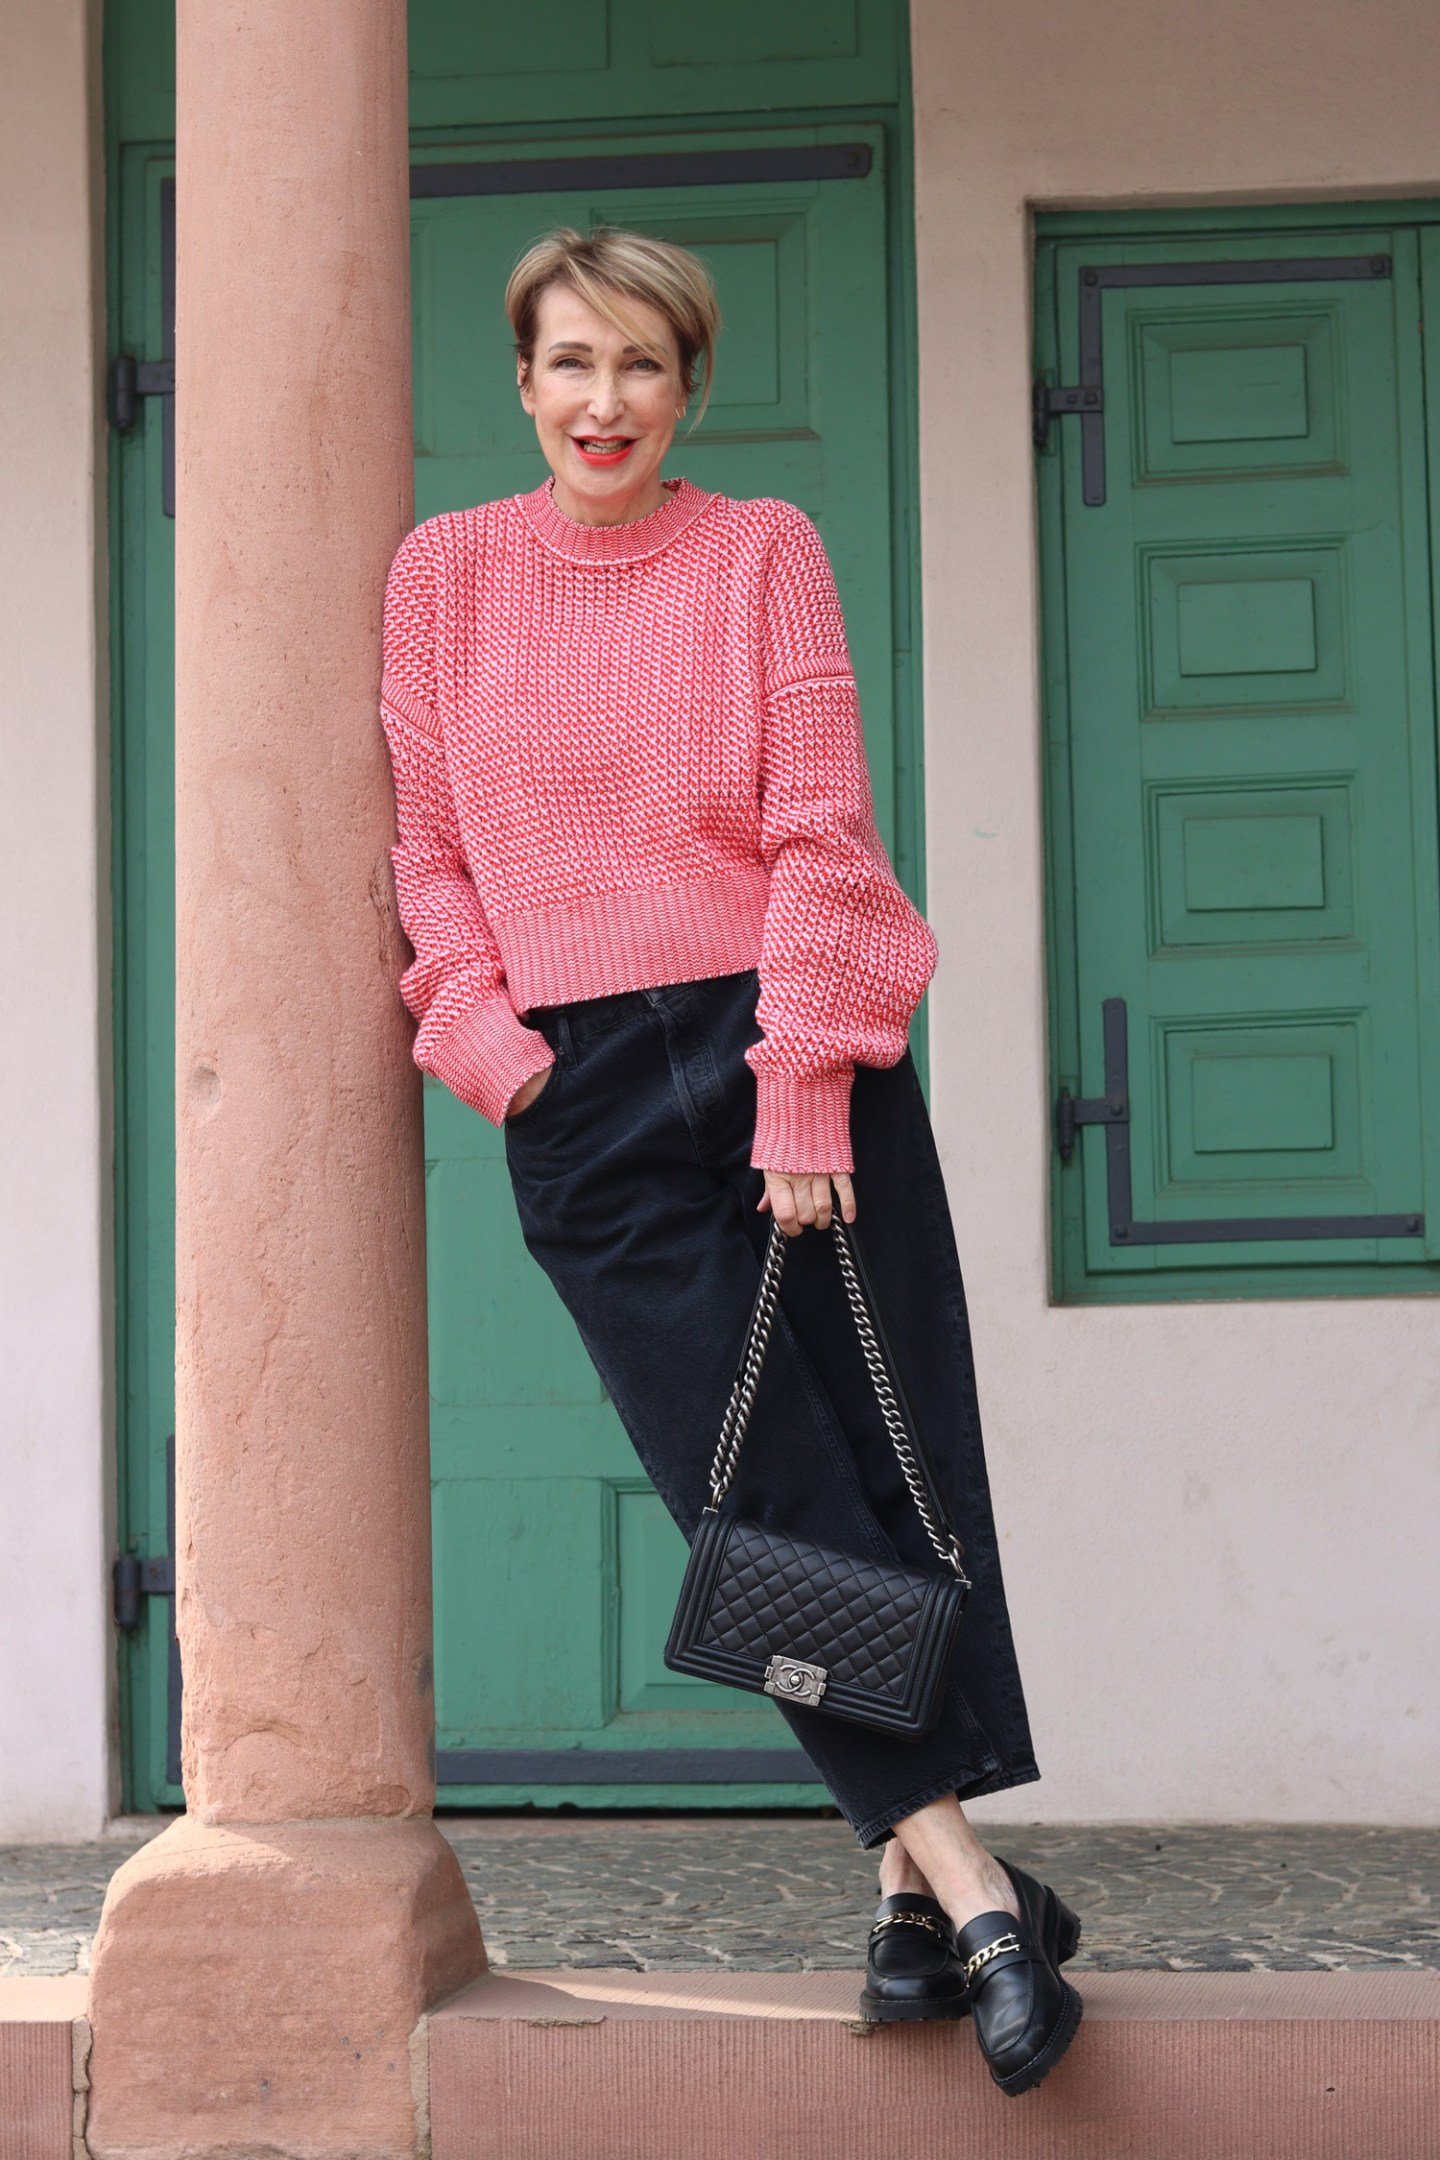 glamupyourlifestyle erfolg bloggen influencer ue-40-blog ue-50-mode